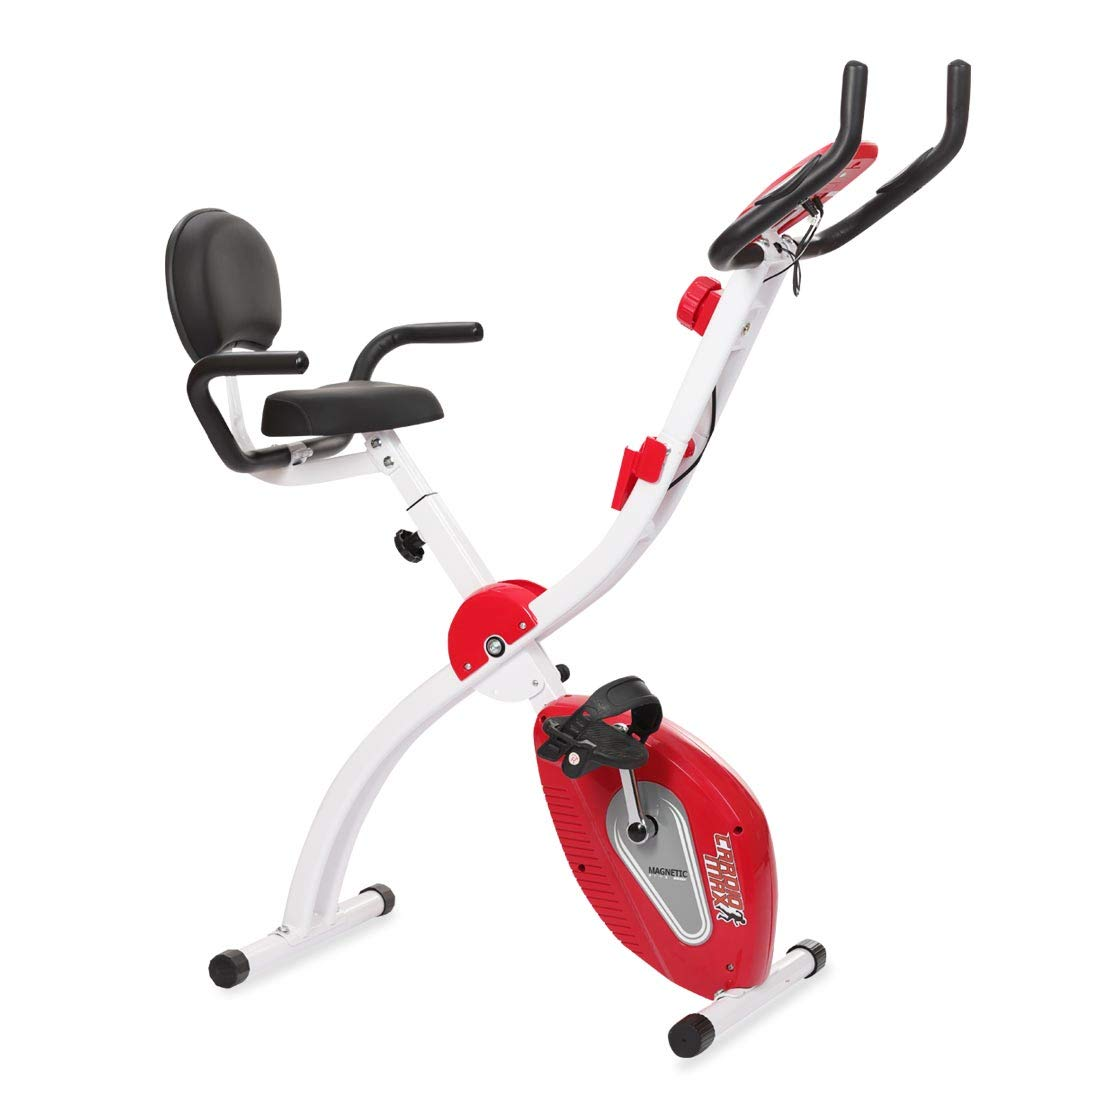 Cardio Max JSB Fitness Bike for Home Gym